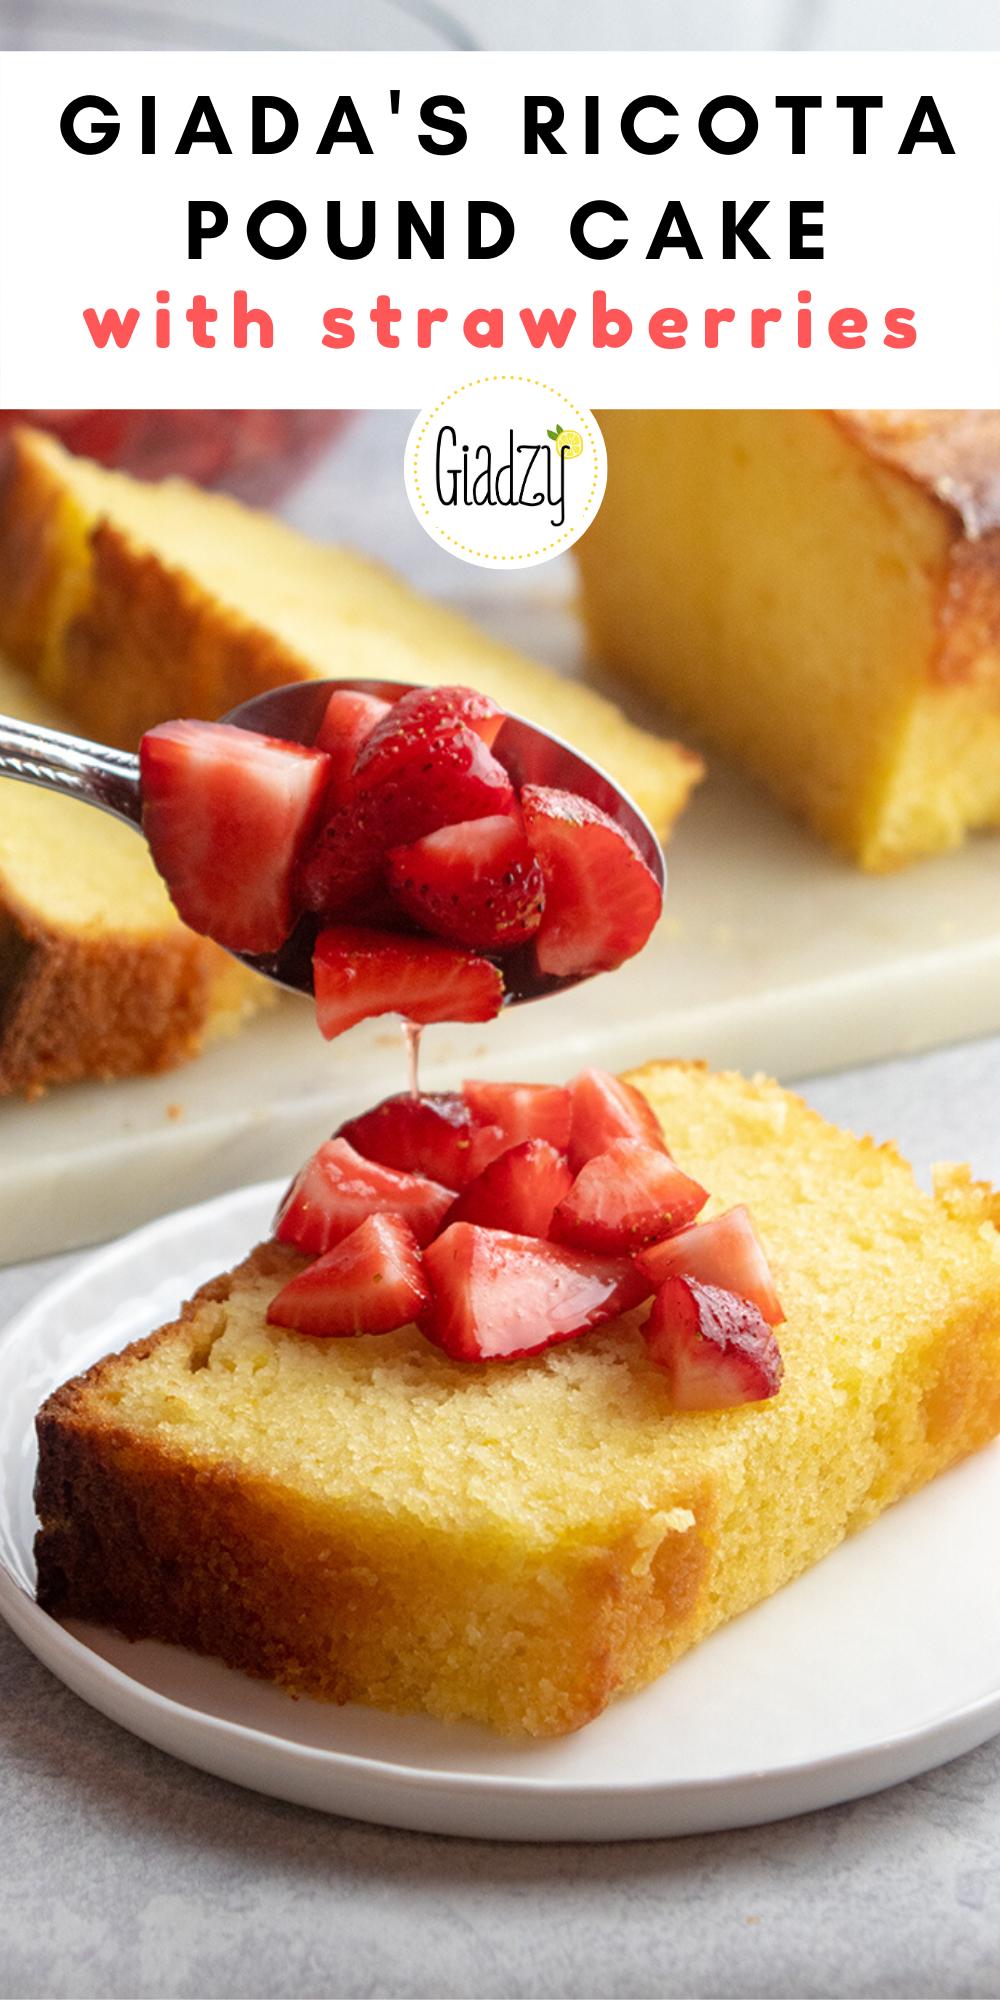 Amaretto Orange Ricotta Pound Cake With Strawberries Giadzy Recipe In 2020 Pound Cake Recipes How Sweet Eats Ricotta Pound Cake